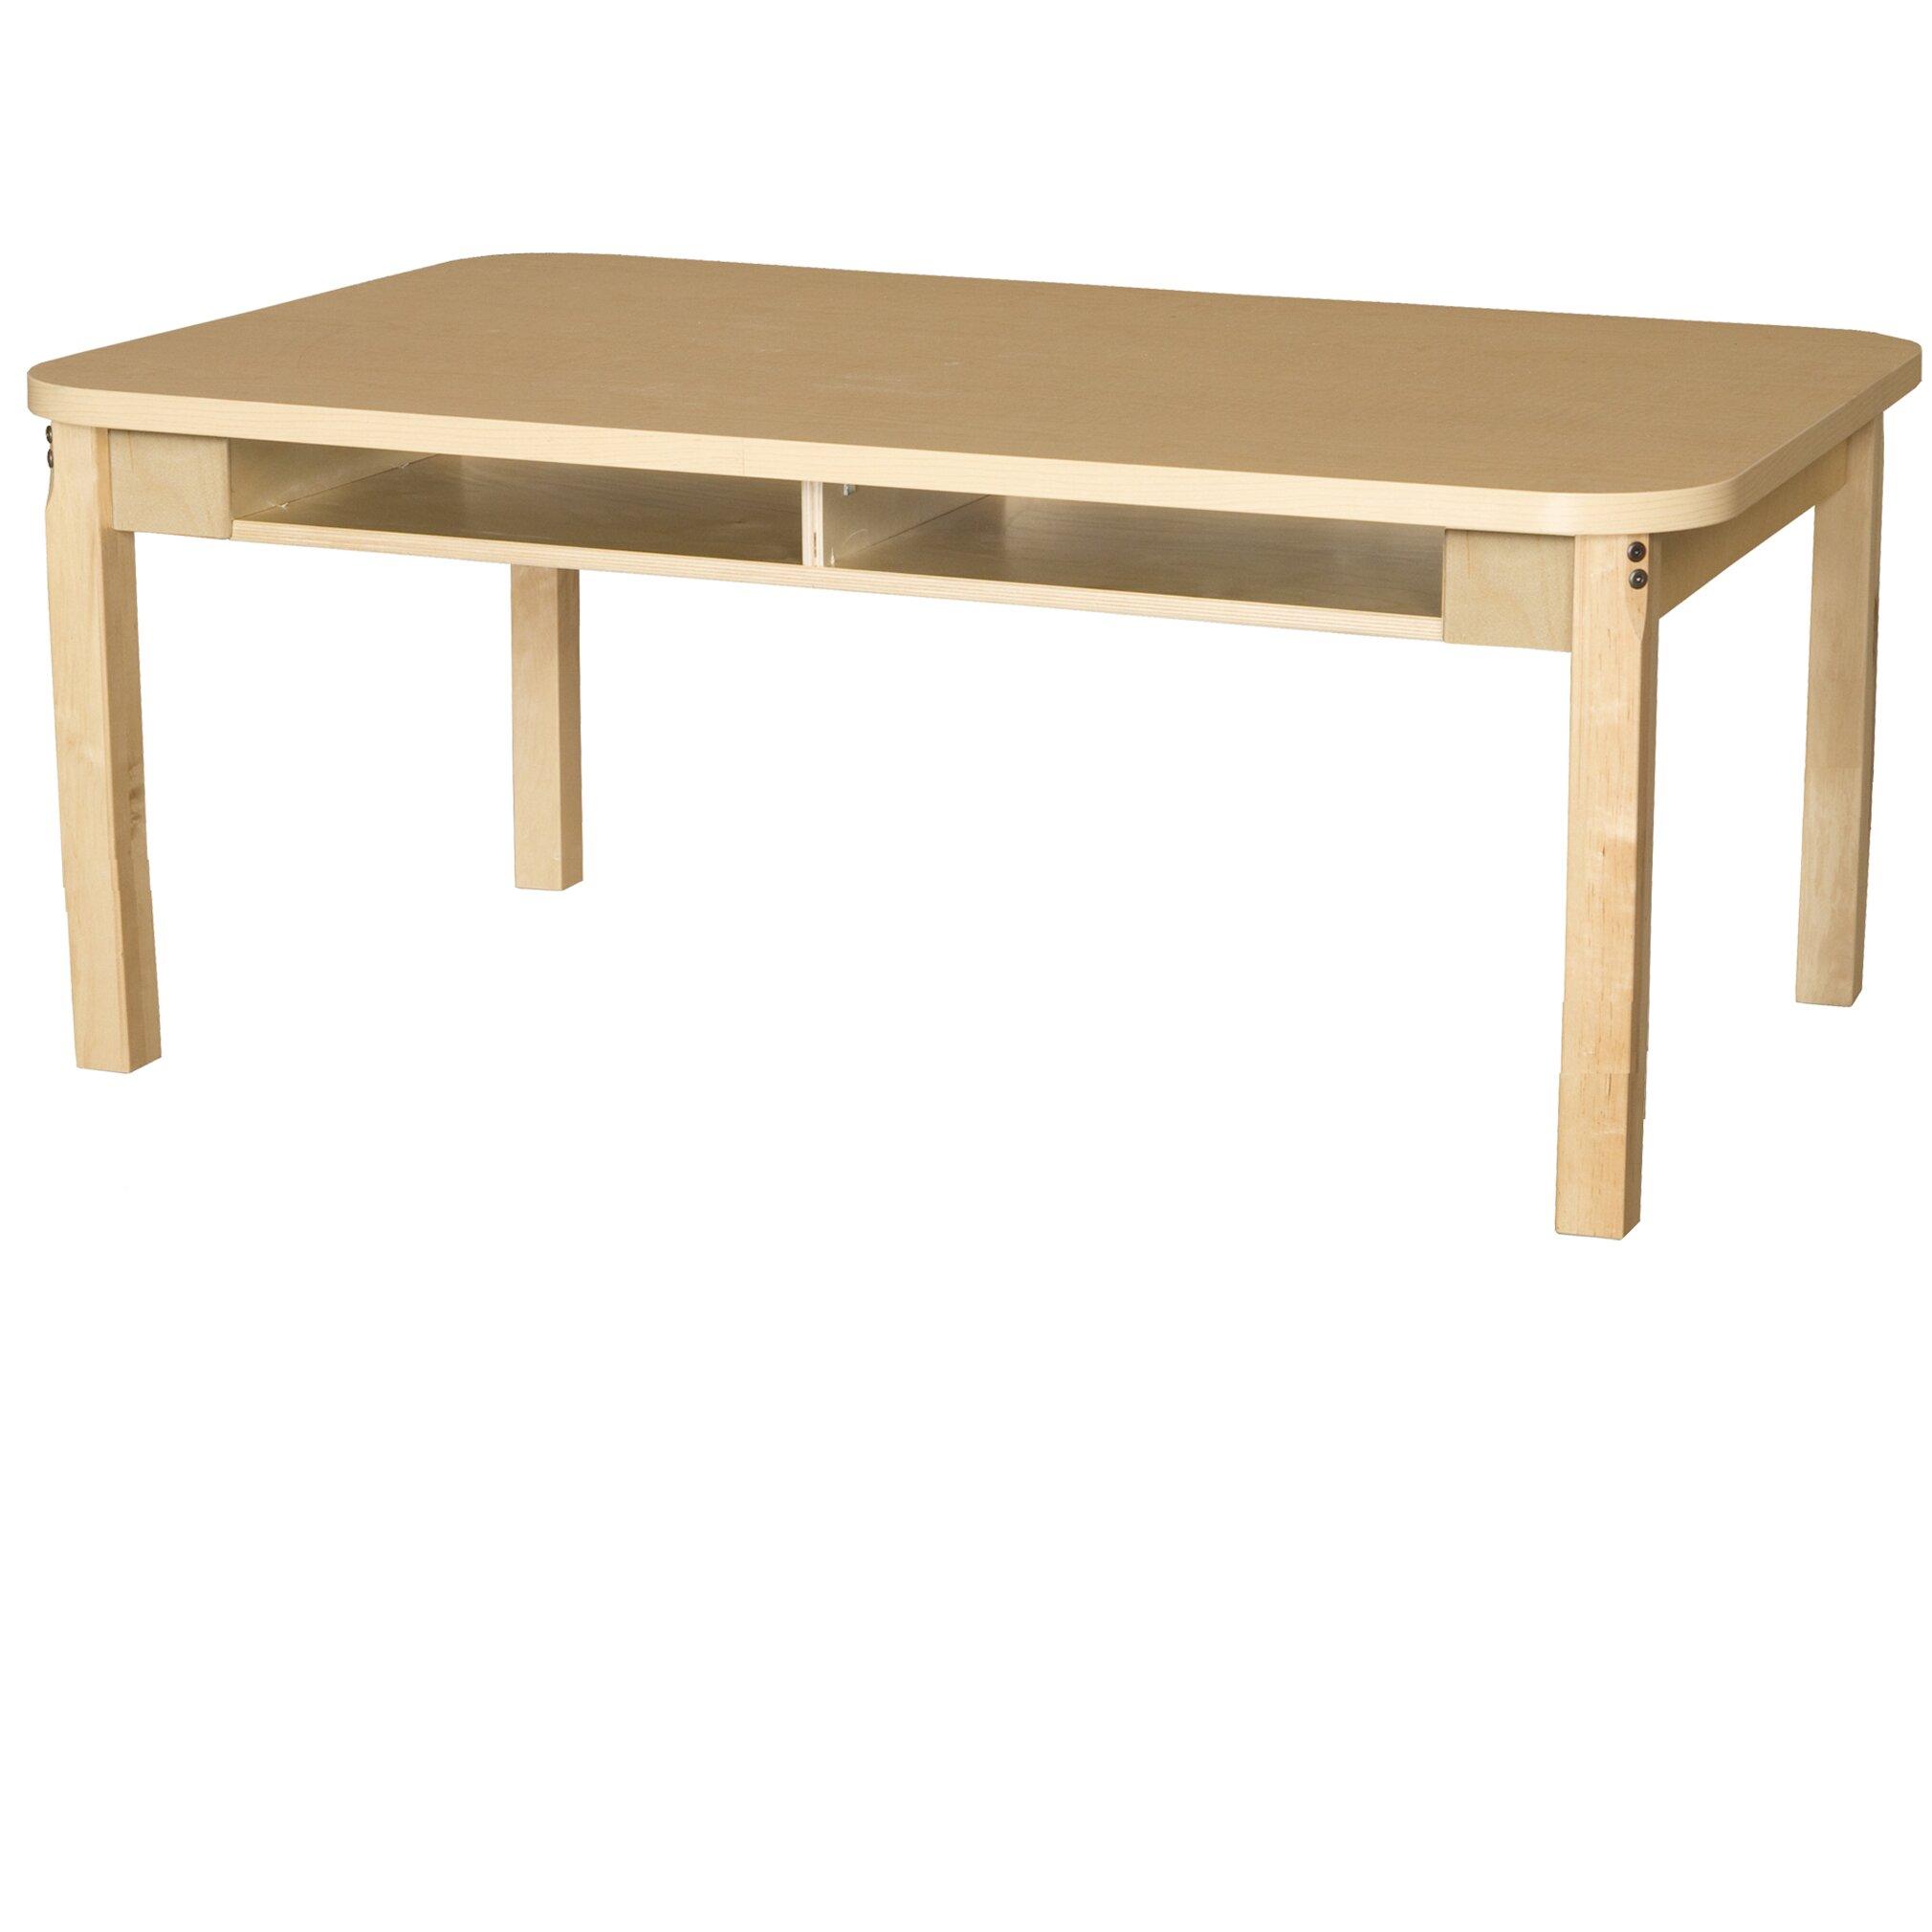 Mdf laminate adjustable height standard desk wayfair - Standard desk chair height ...